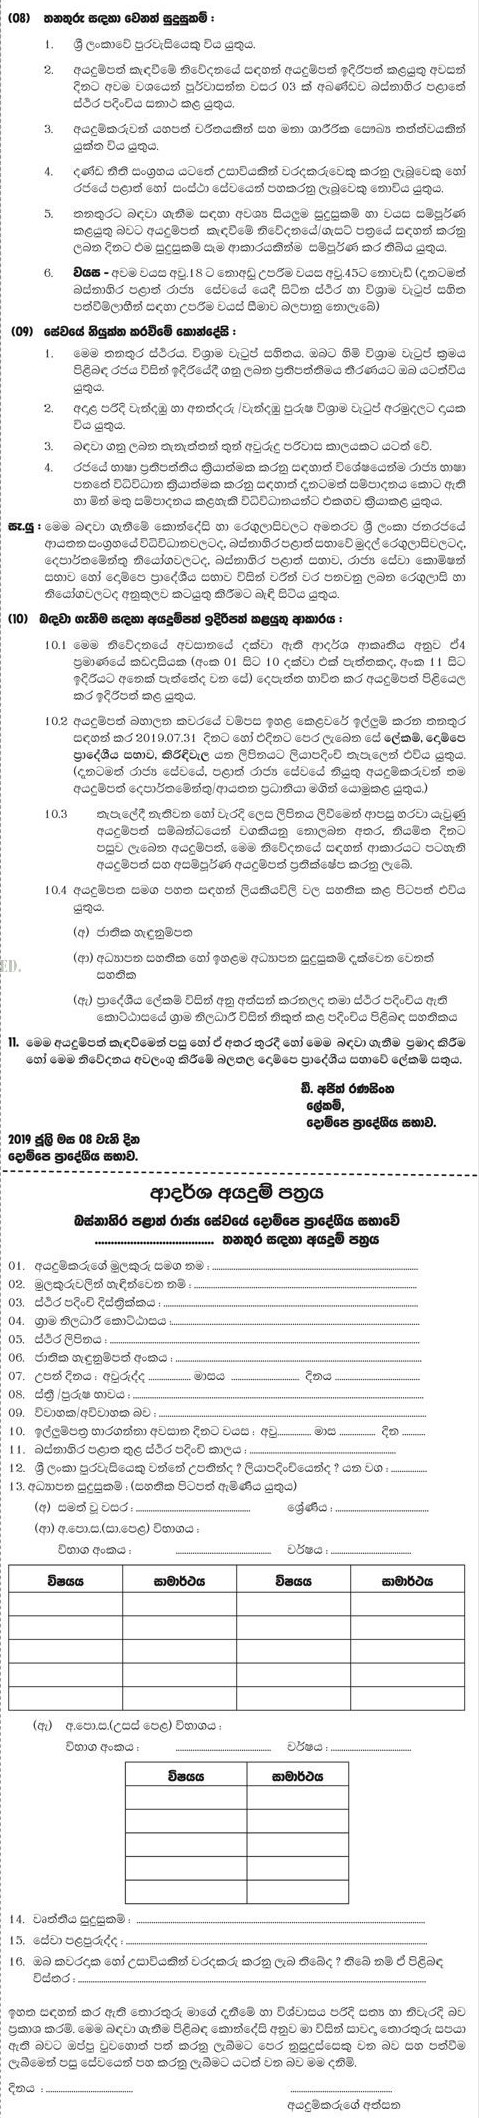 Office Employee Assistant (KKS), Library Assistant, Driver, Dispenser, Health Labourer, Work/Field Labourer, Watcher - Dompe Pradeshiya Sabha